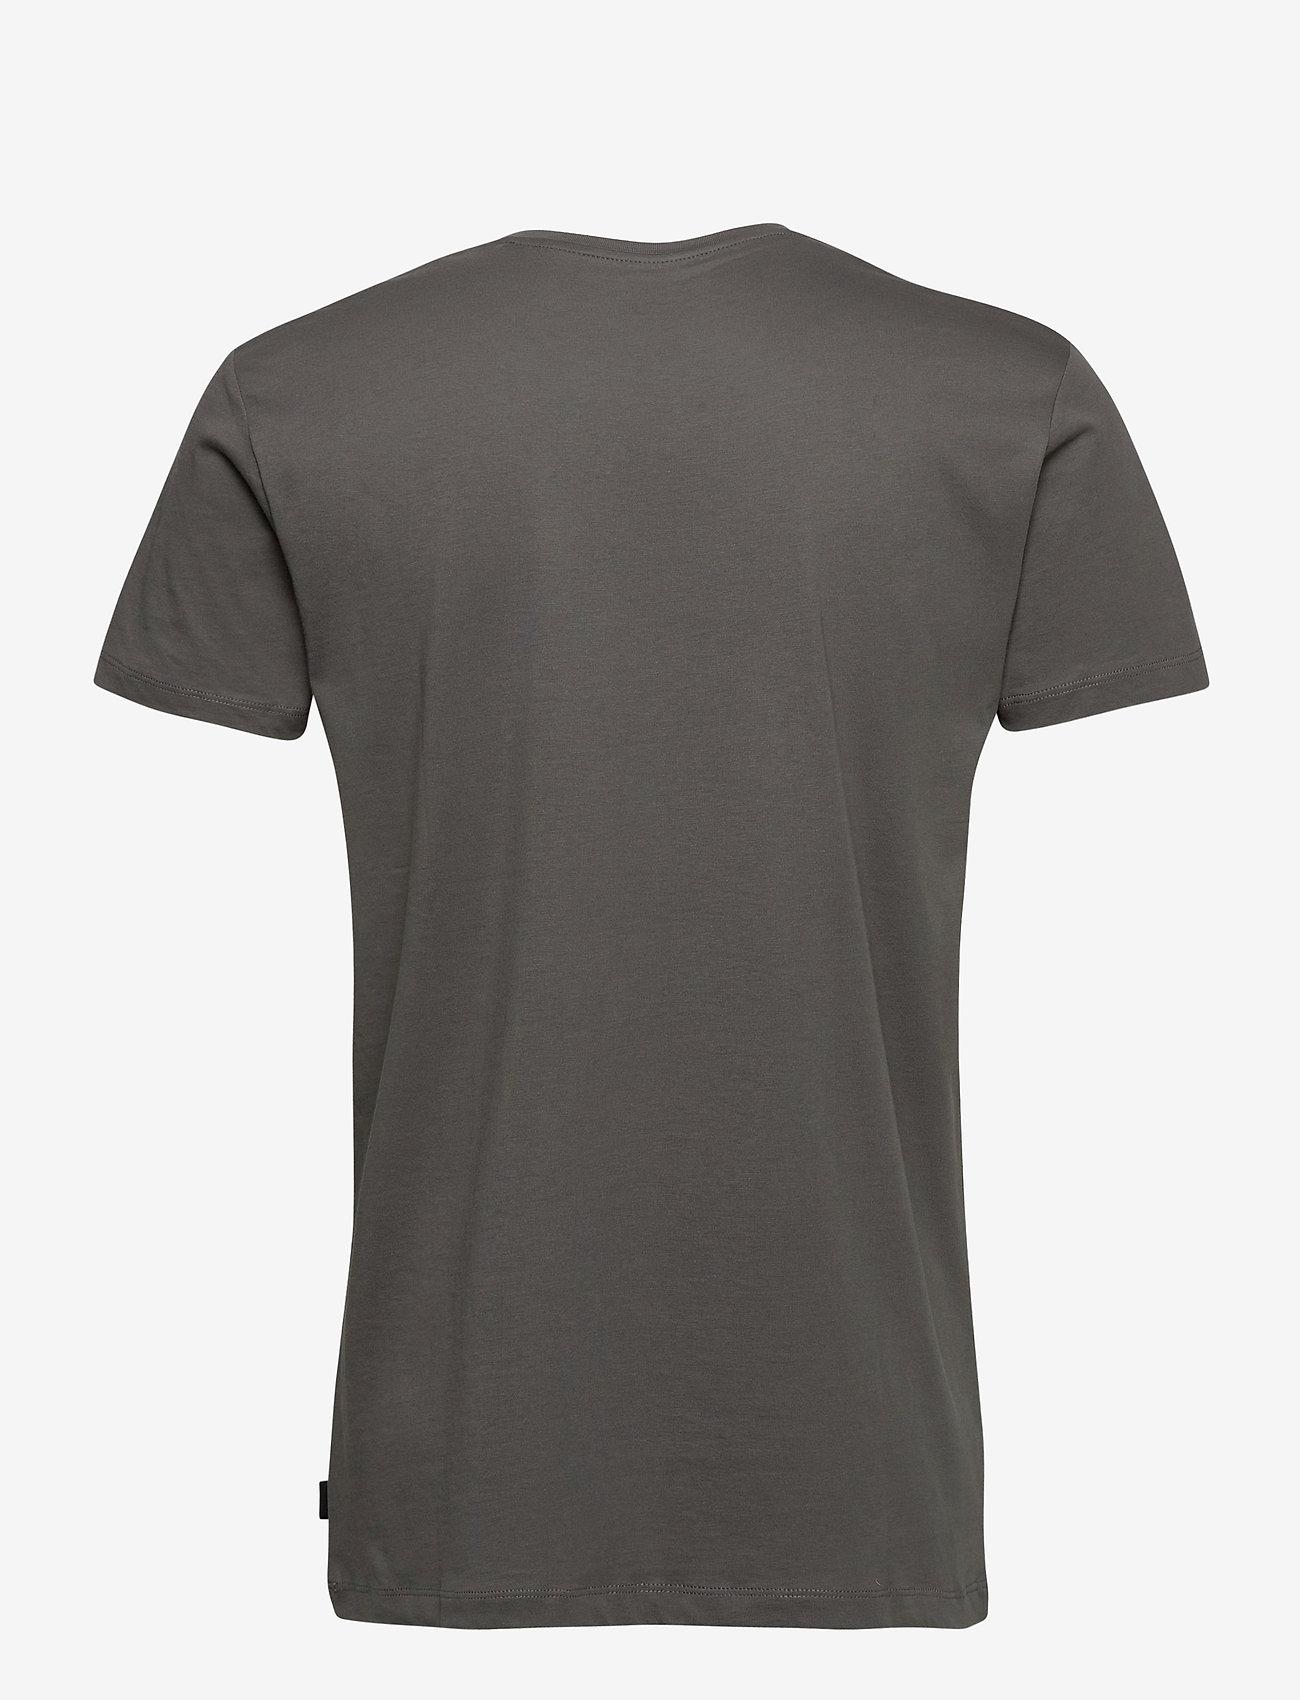 Esprit Casual - T-Shirts - basic t-shirts - dark grey - 1